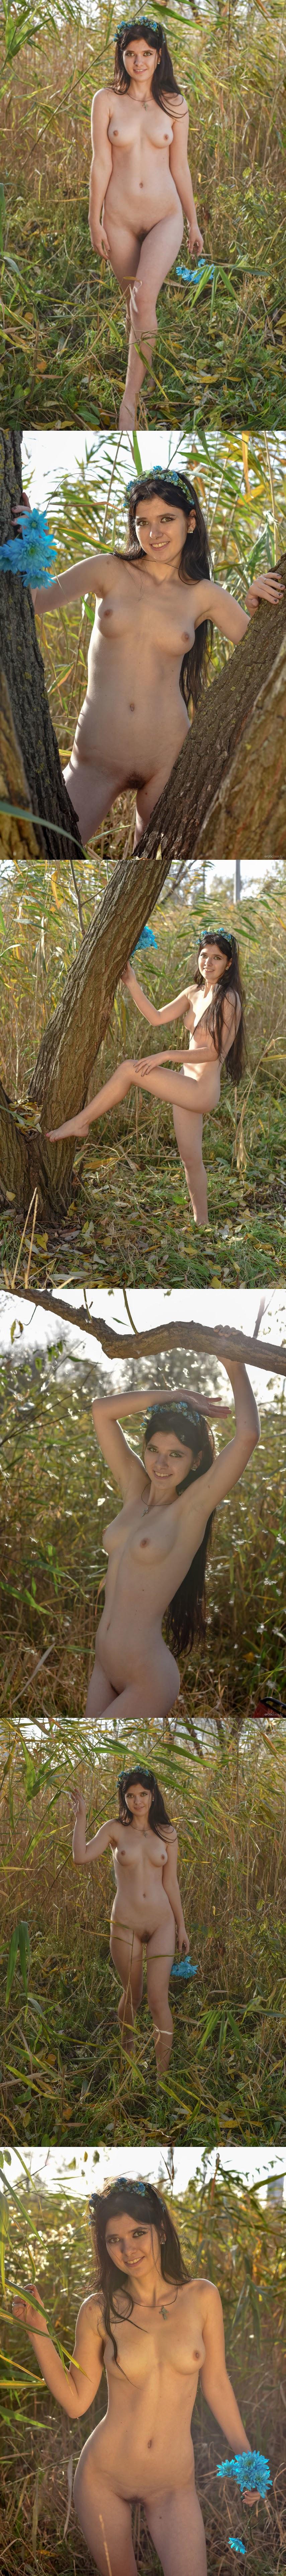 [EroticBeauty] Stasiya - Grasslands